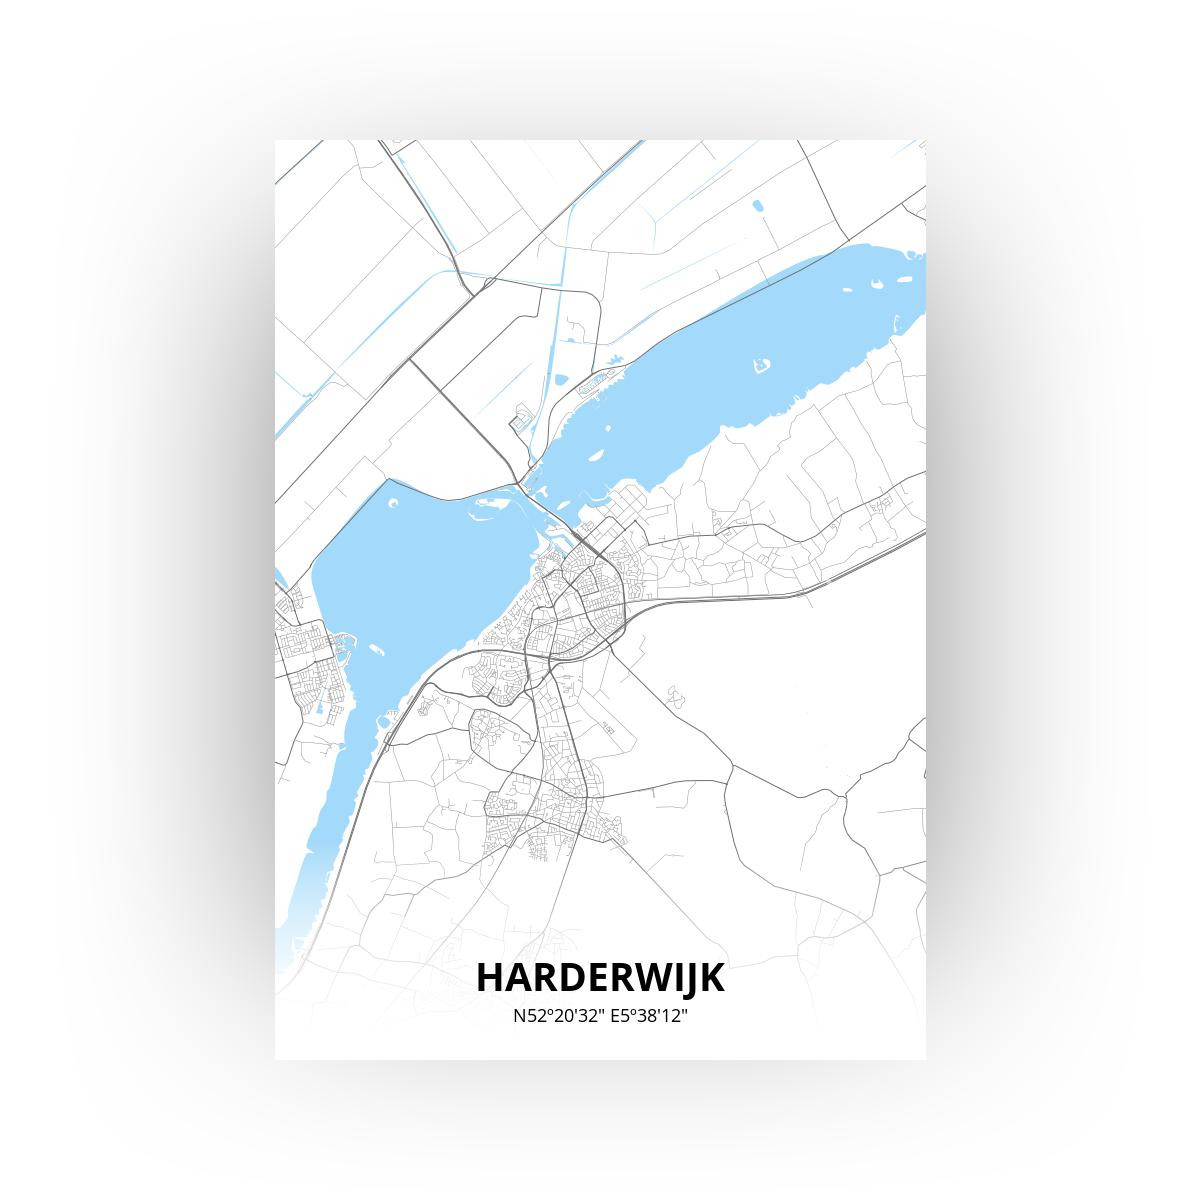 Harderwijk print - Standaard stijl